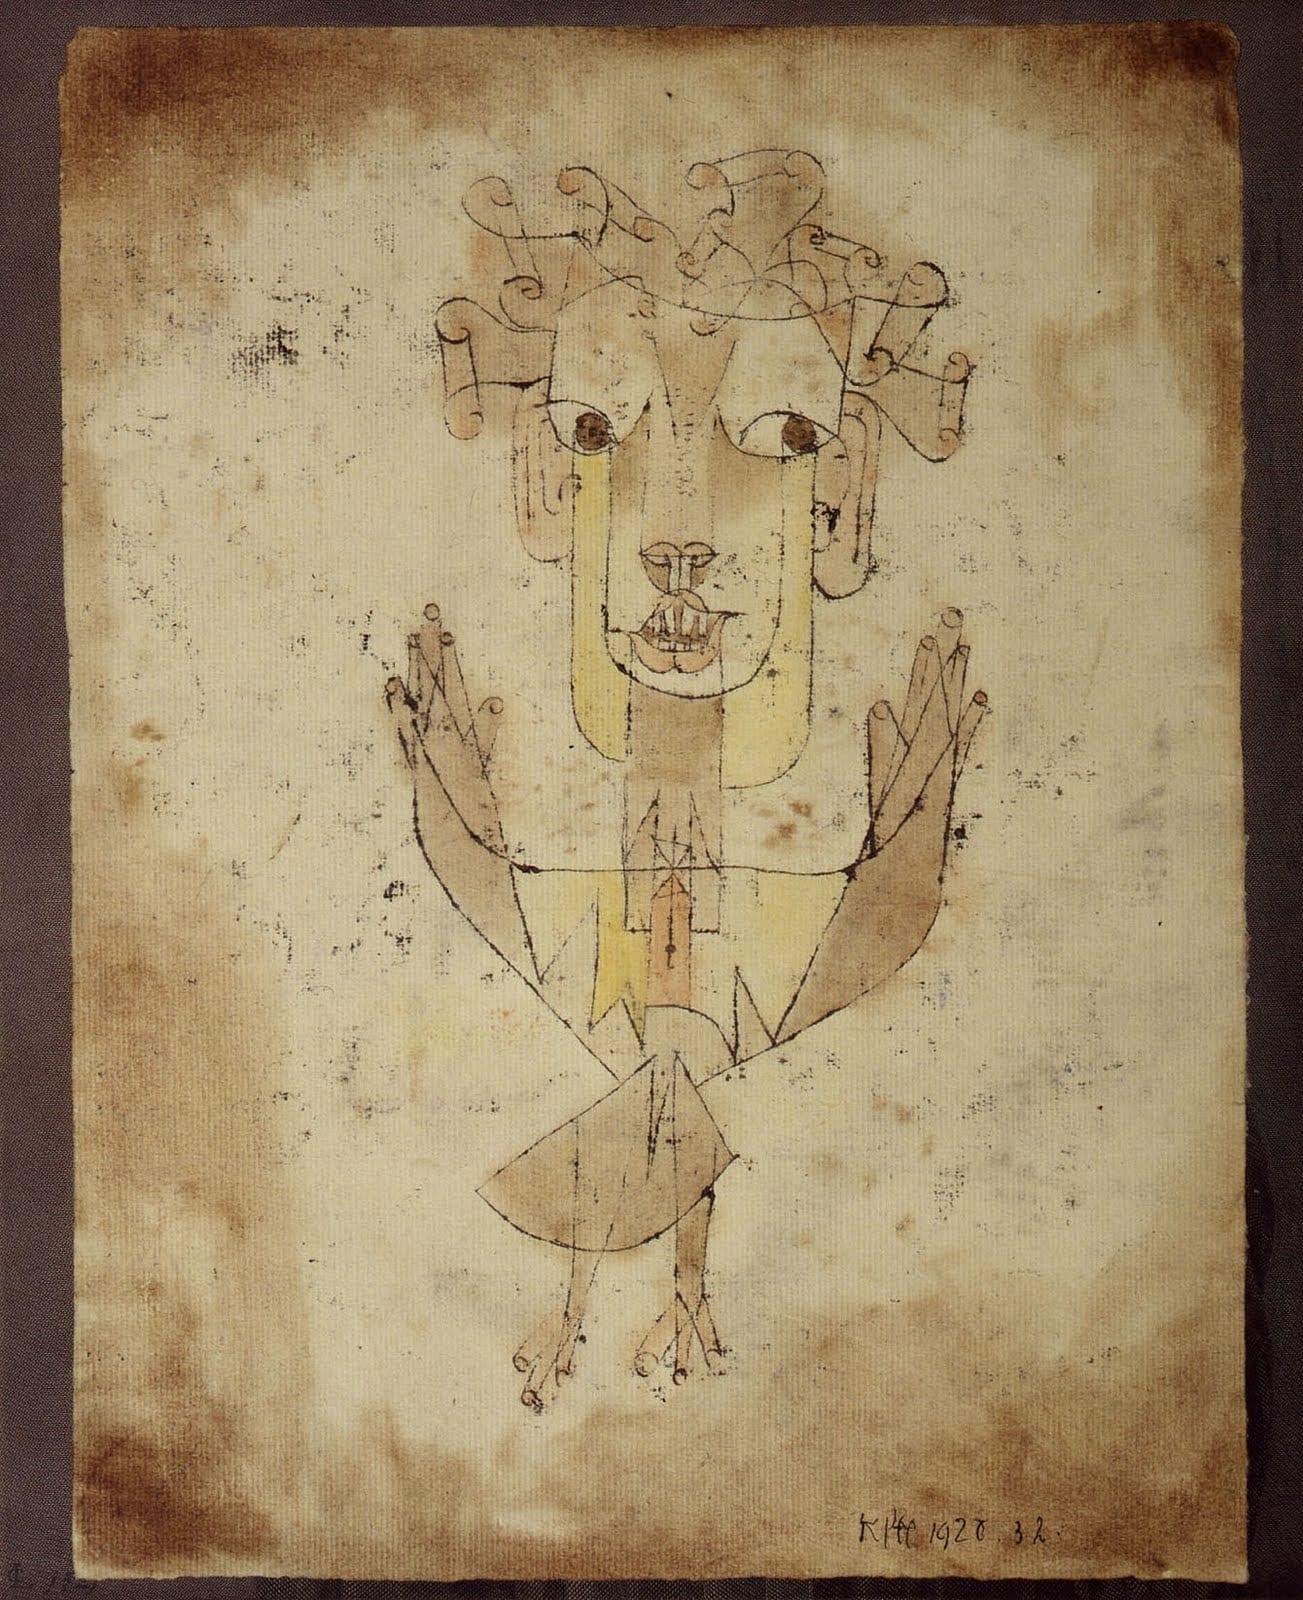 Пауль Клее. Angelus Novus (New Angel). 1920